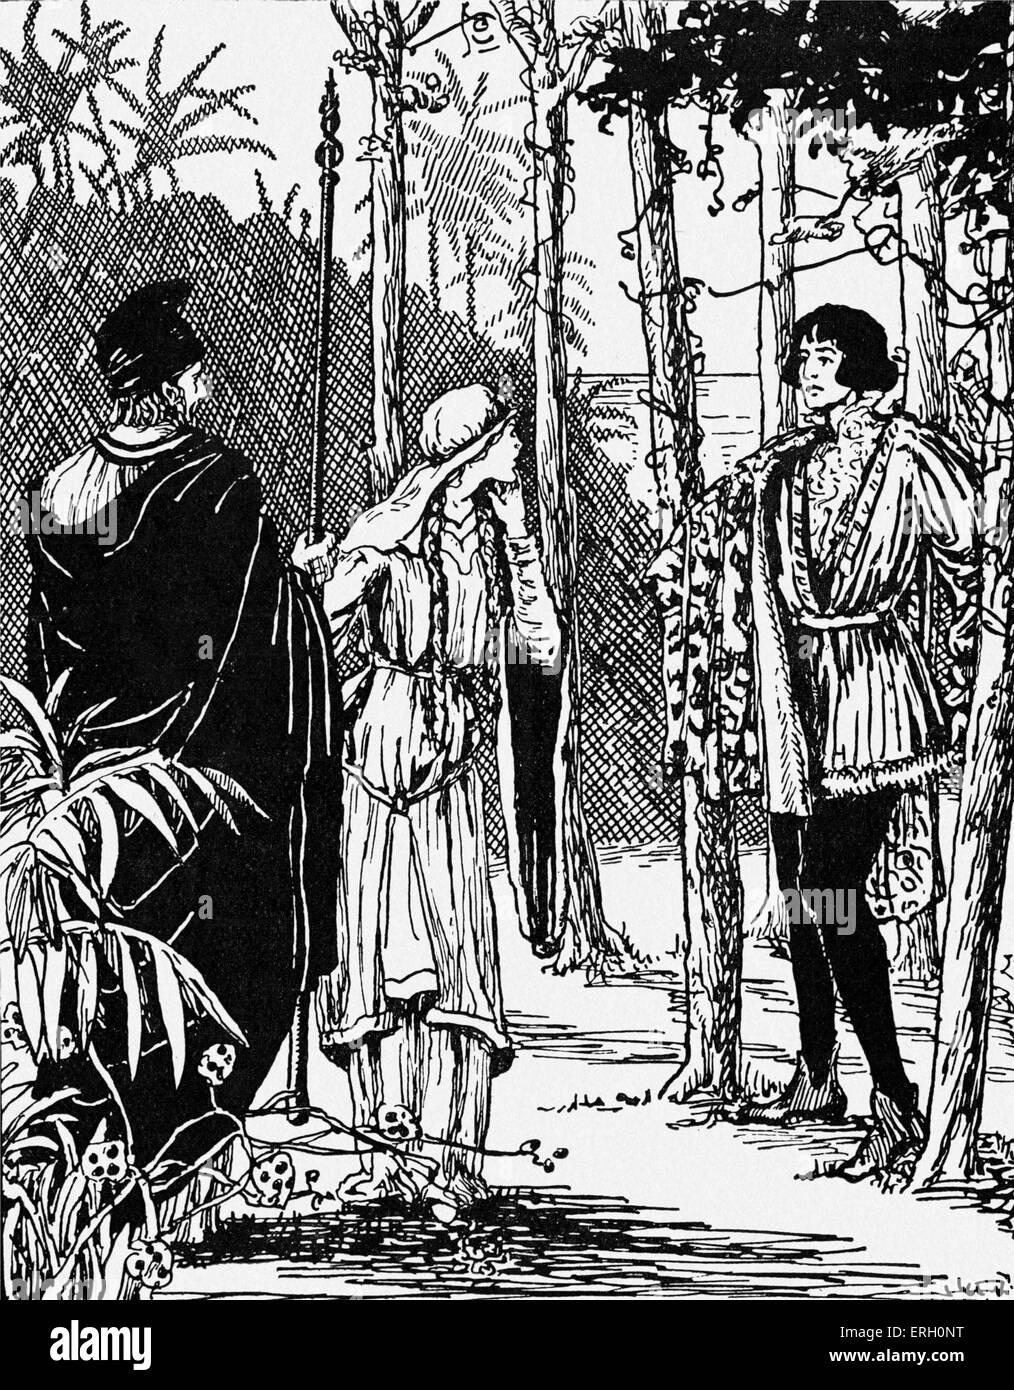 dating Shakespeare sauvat